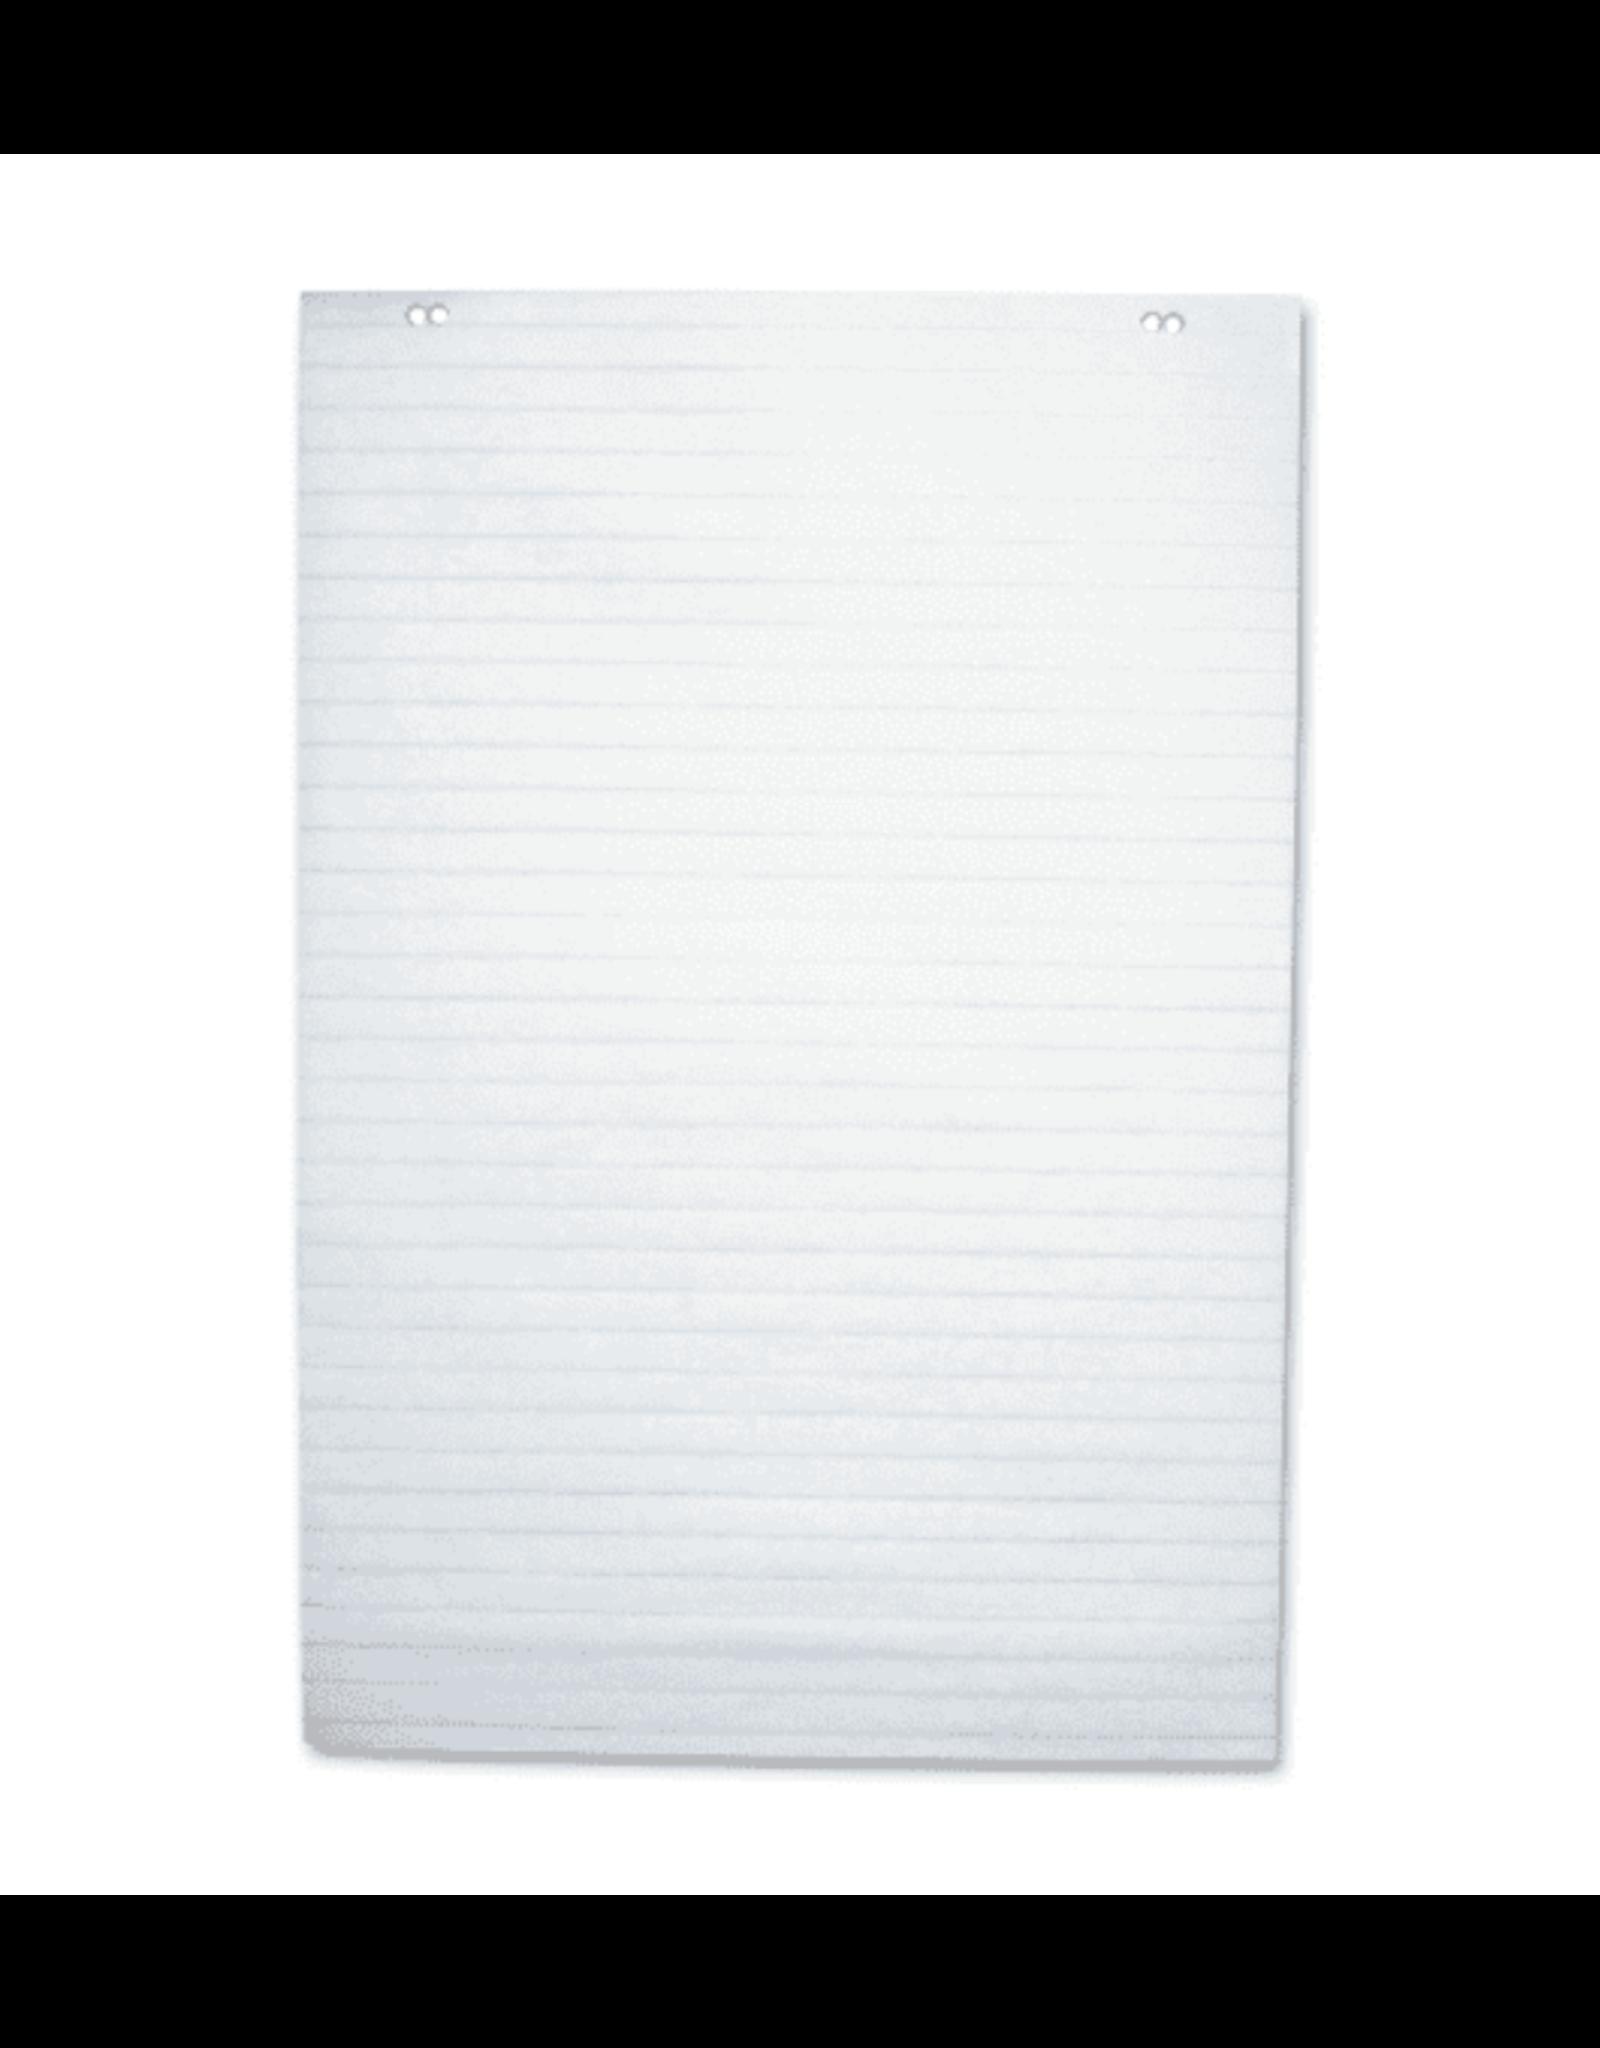 Iconex FLIP CHART PAD-24X36 BOND, RULED (63308)